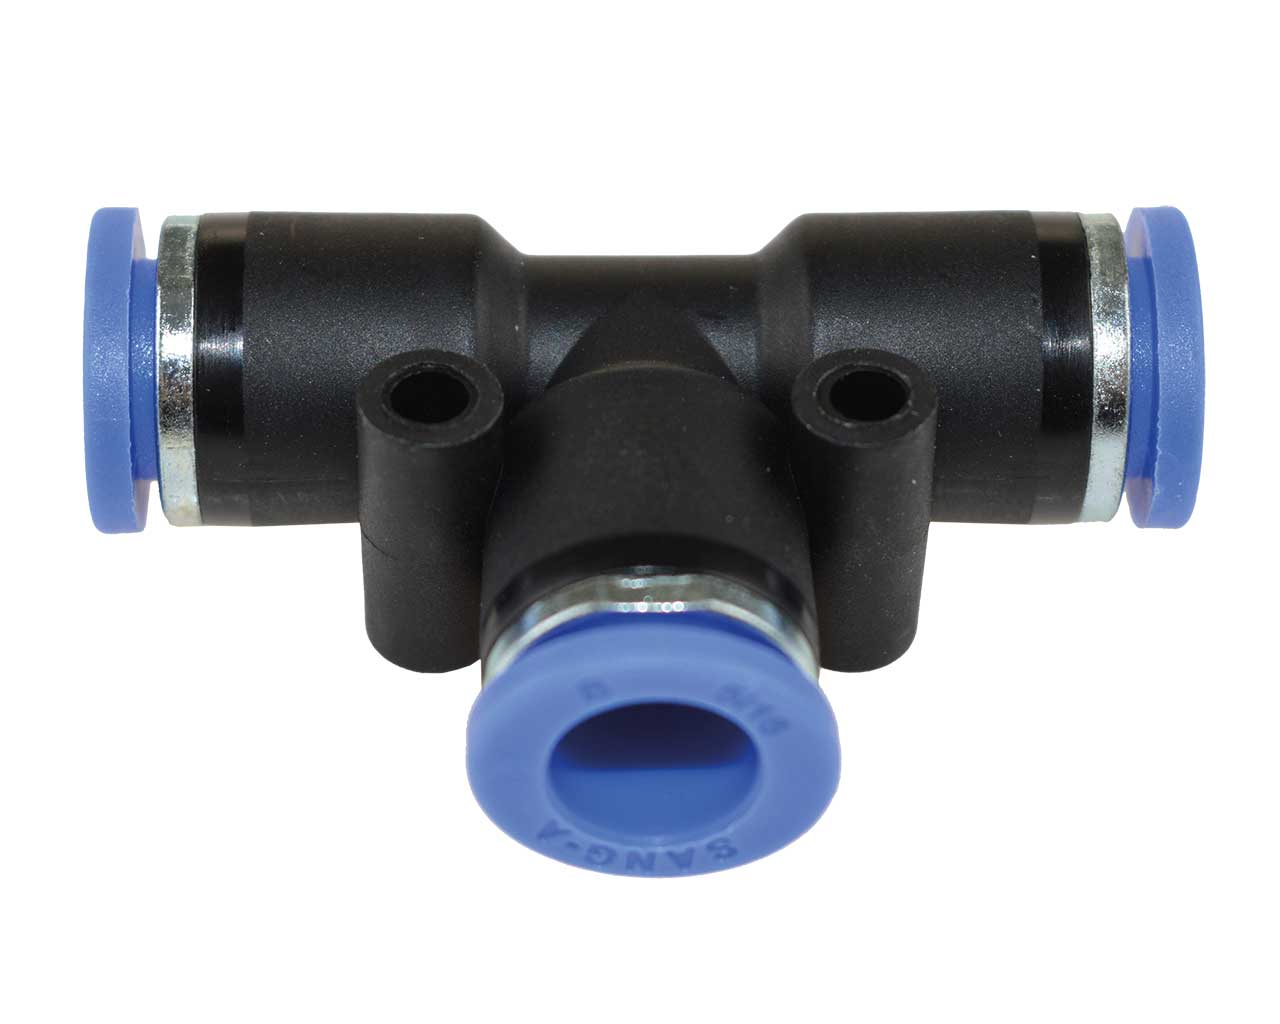 2stk Steckverbinder Steckanschluss T-Form Pneumatik Druckluft Luftverteiler 4mm